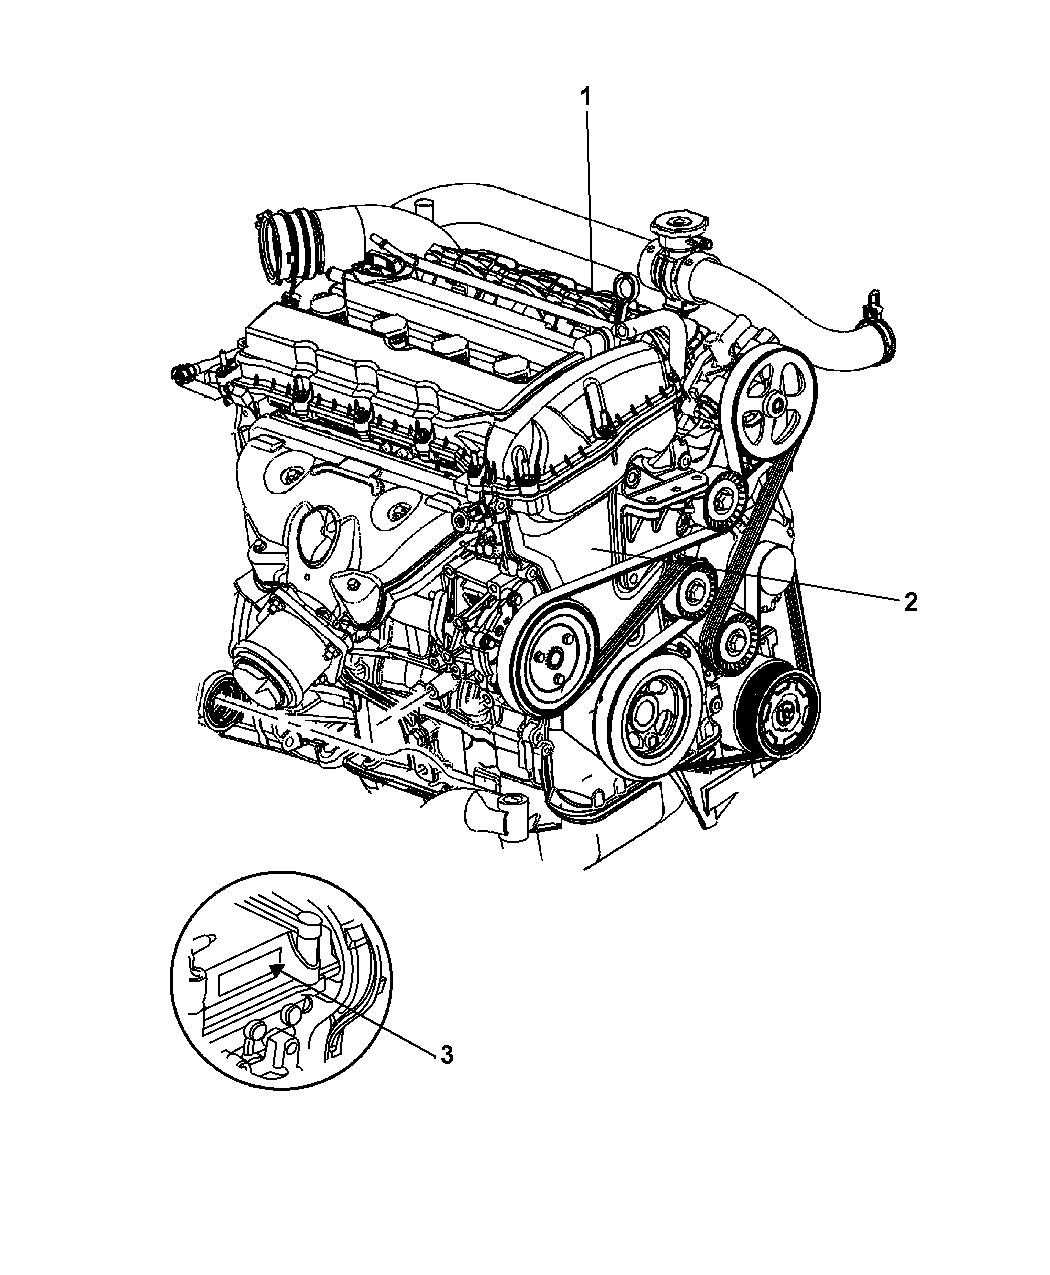 4884884ca genuine jeep engine long block. Black Bedroom Furniture Sets. Home Design Ideas